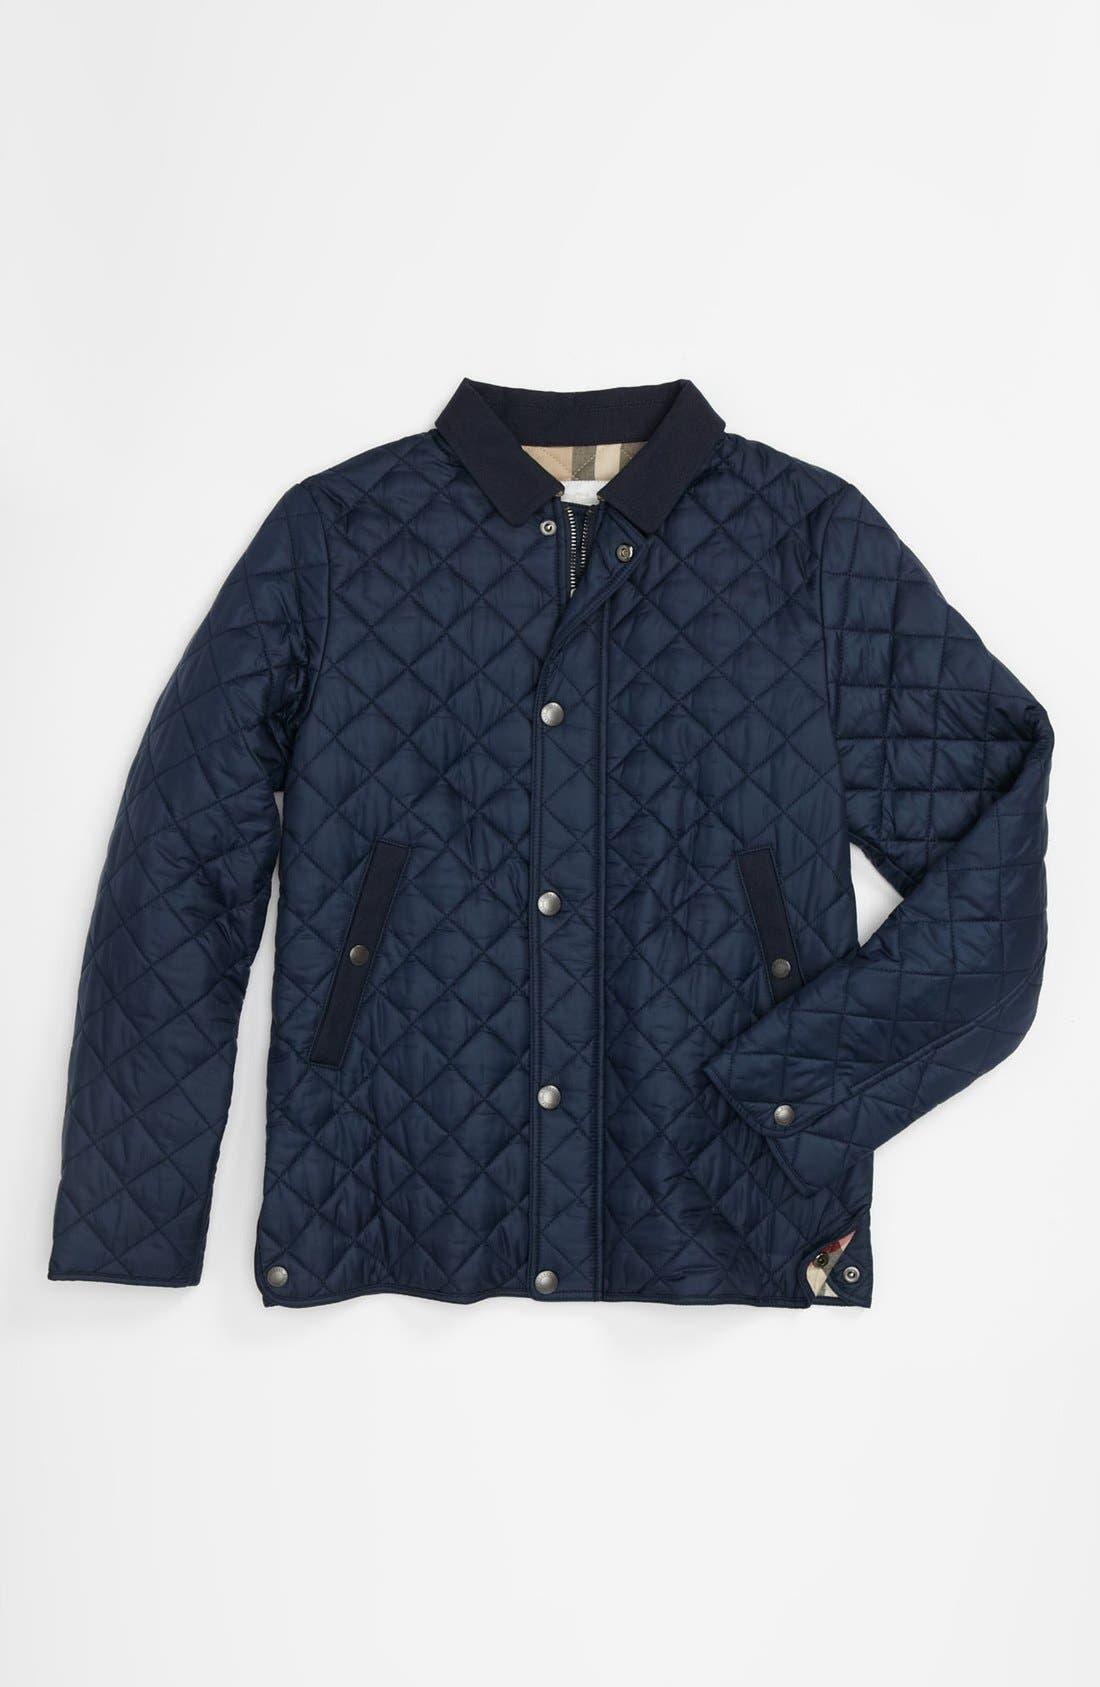 Alternate Image 1 Selected - Burberry 'Luke' Quilted Jacket (Little Boys & Big Boys)